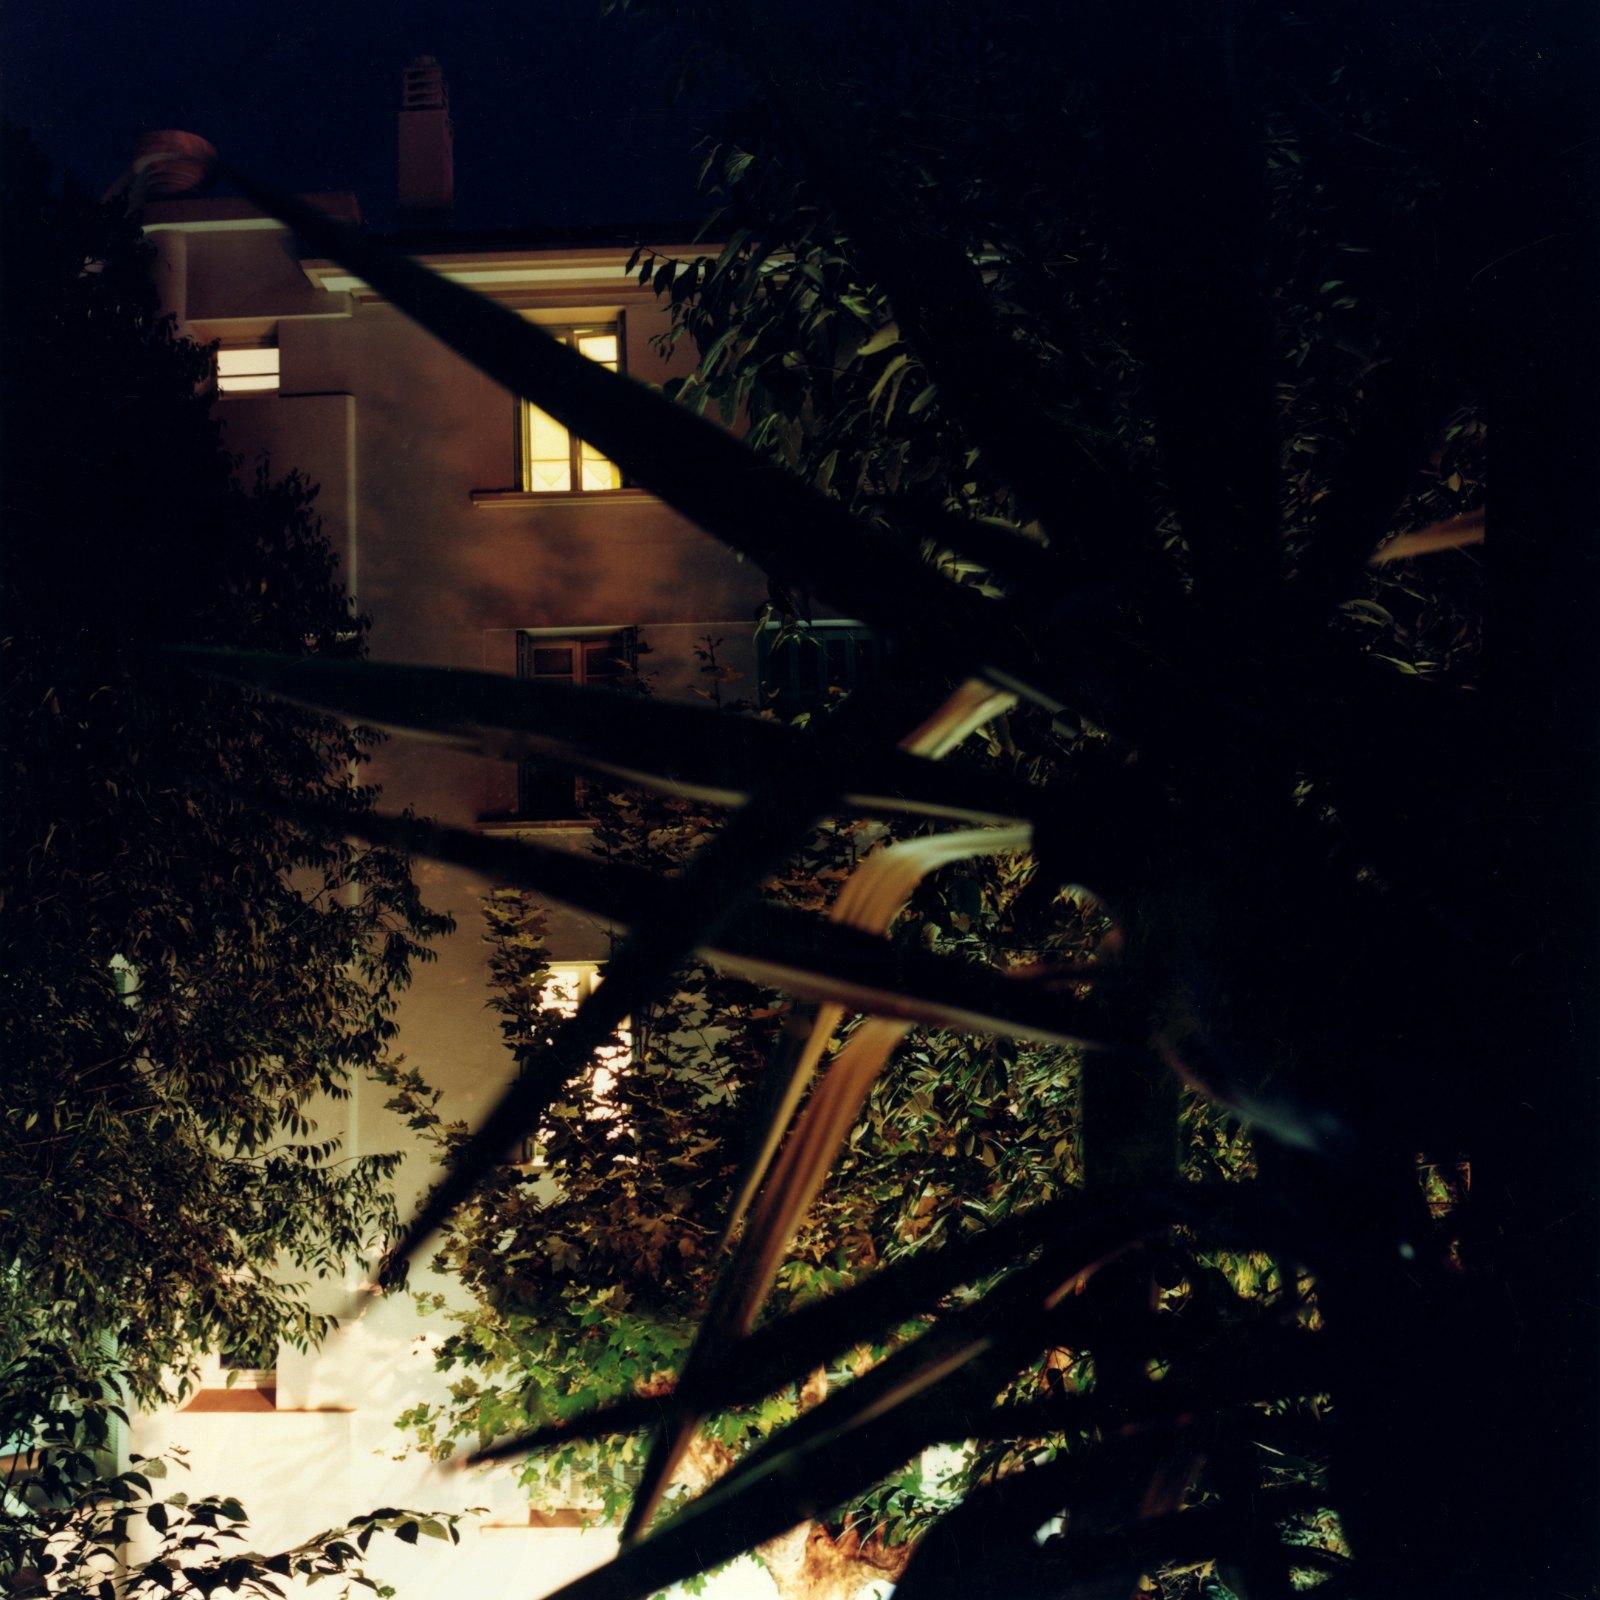 Balcony Bird 23:04, 2008, C-print, 100 x 100 cm